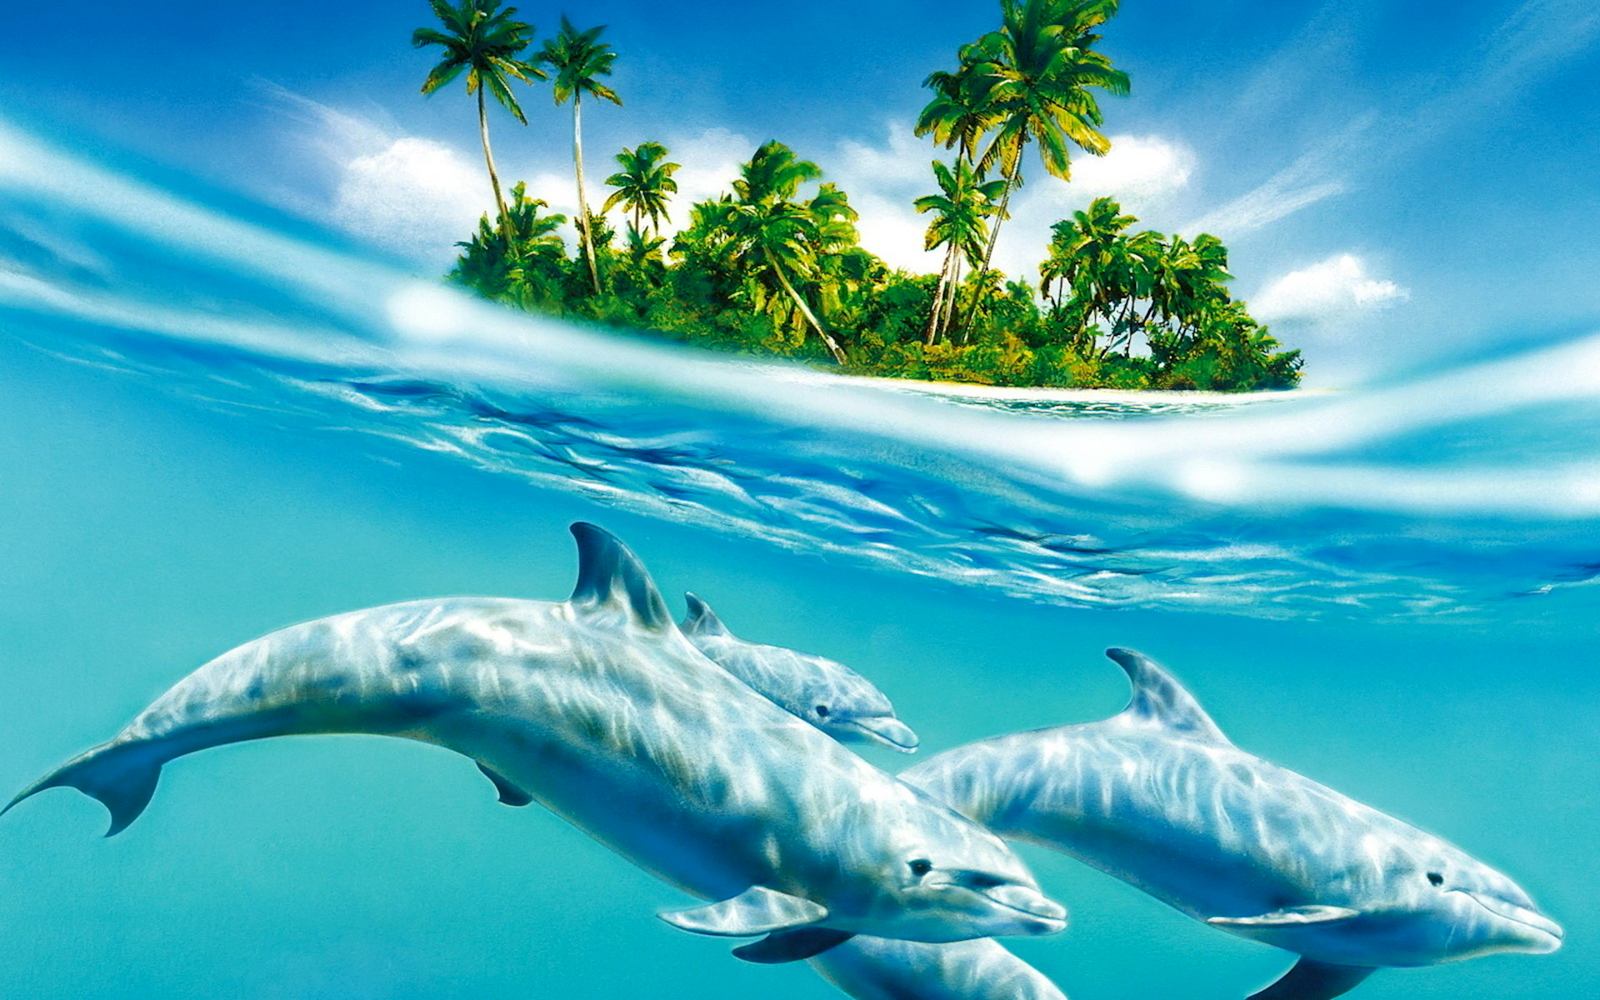 http://3.bp.blogspot.com/-h7GU-y6Qsuw/T_lXEn4SiqI/AAAAAAAACec/MvnXFCUtkhM/s1600/Dolphins_Underwater_Tropic_Island_Half_View_HD_Wallpaper-Vvallpaper.Net.jpg